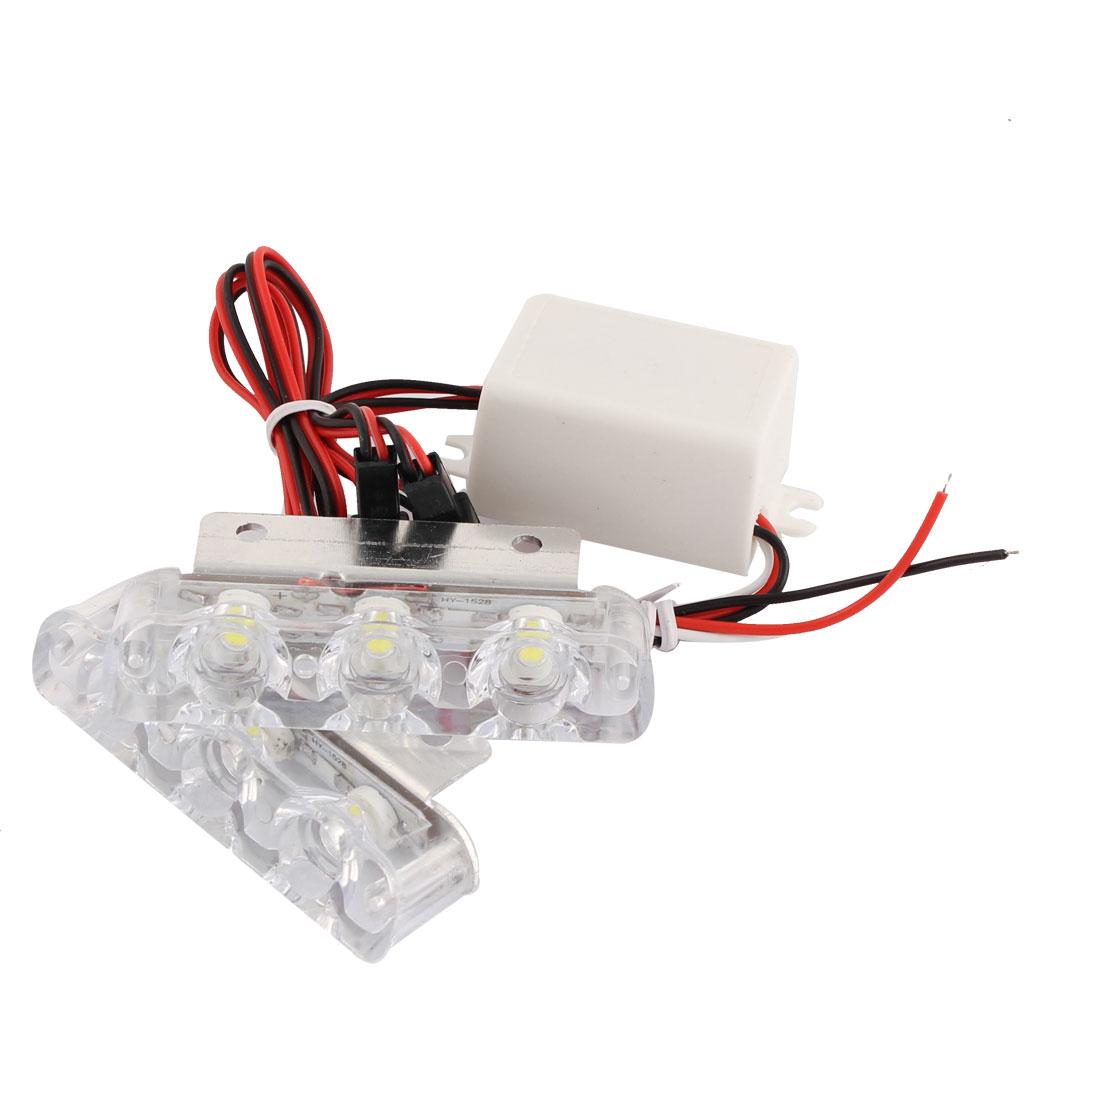 Pair White 6 LED Car DRL Daytime Running Driving Light Warning Flash Lamp DC 12V